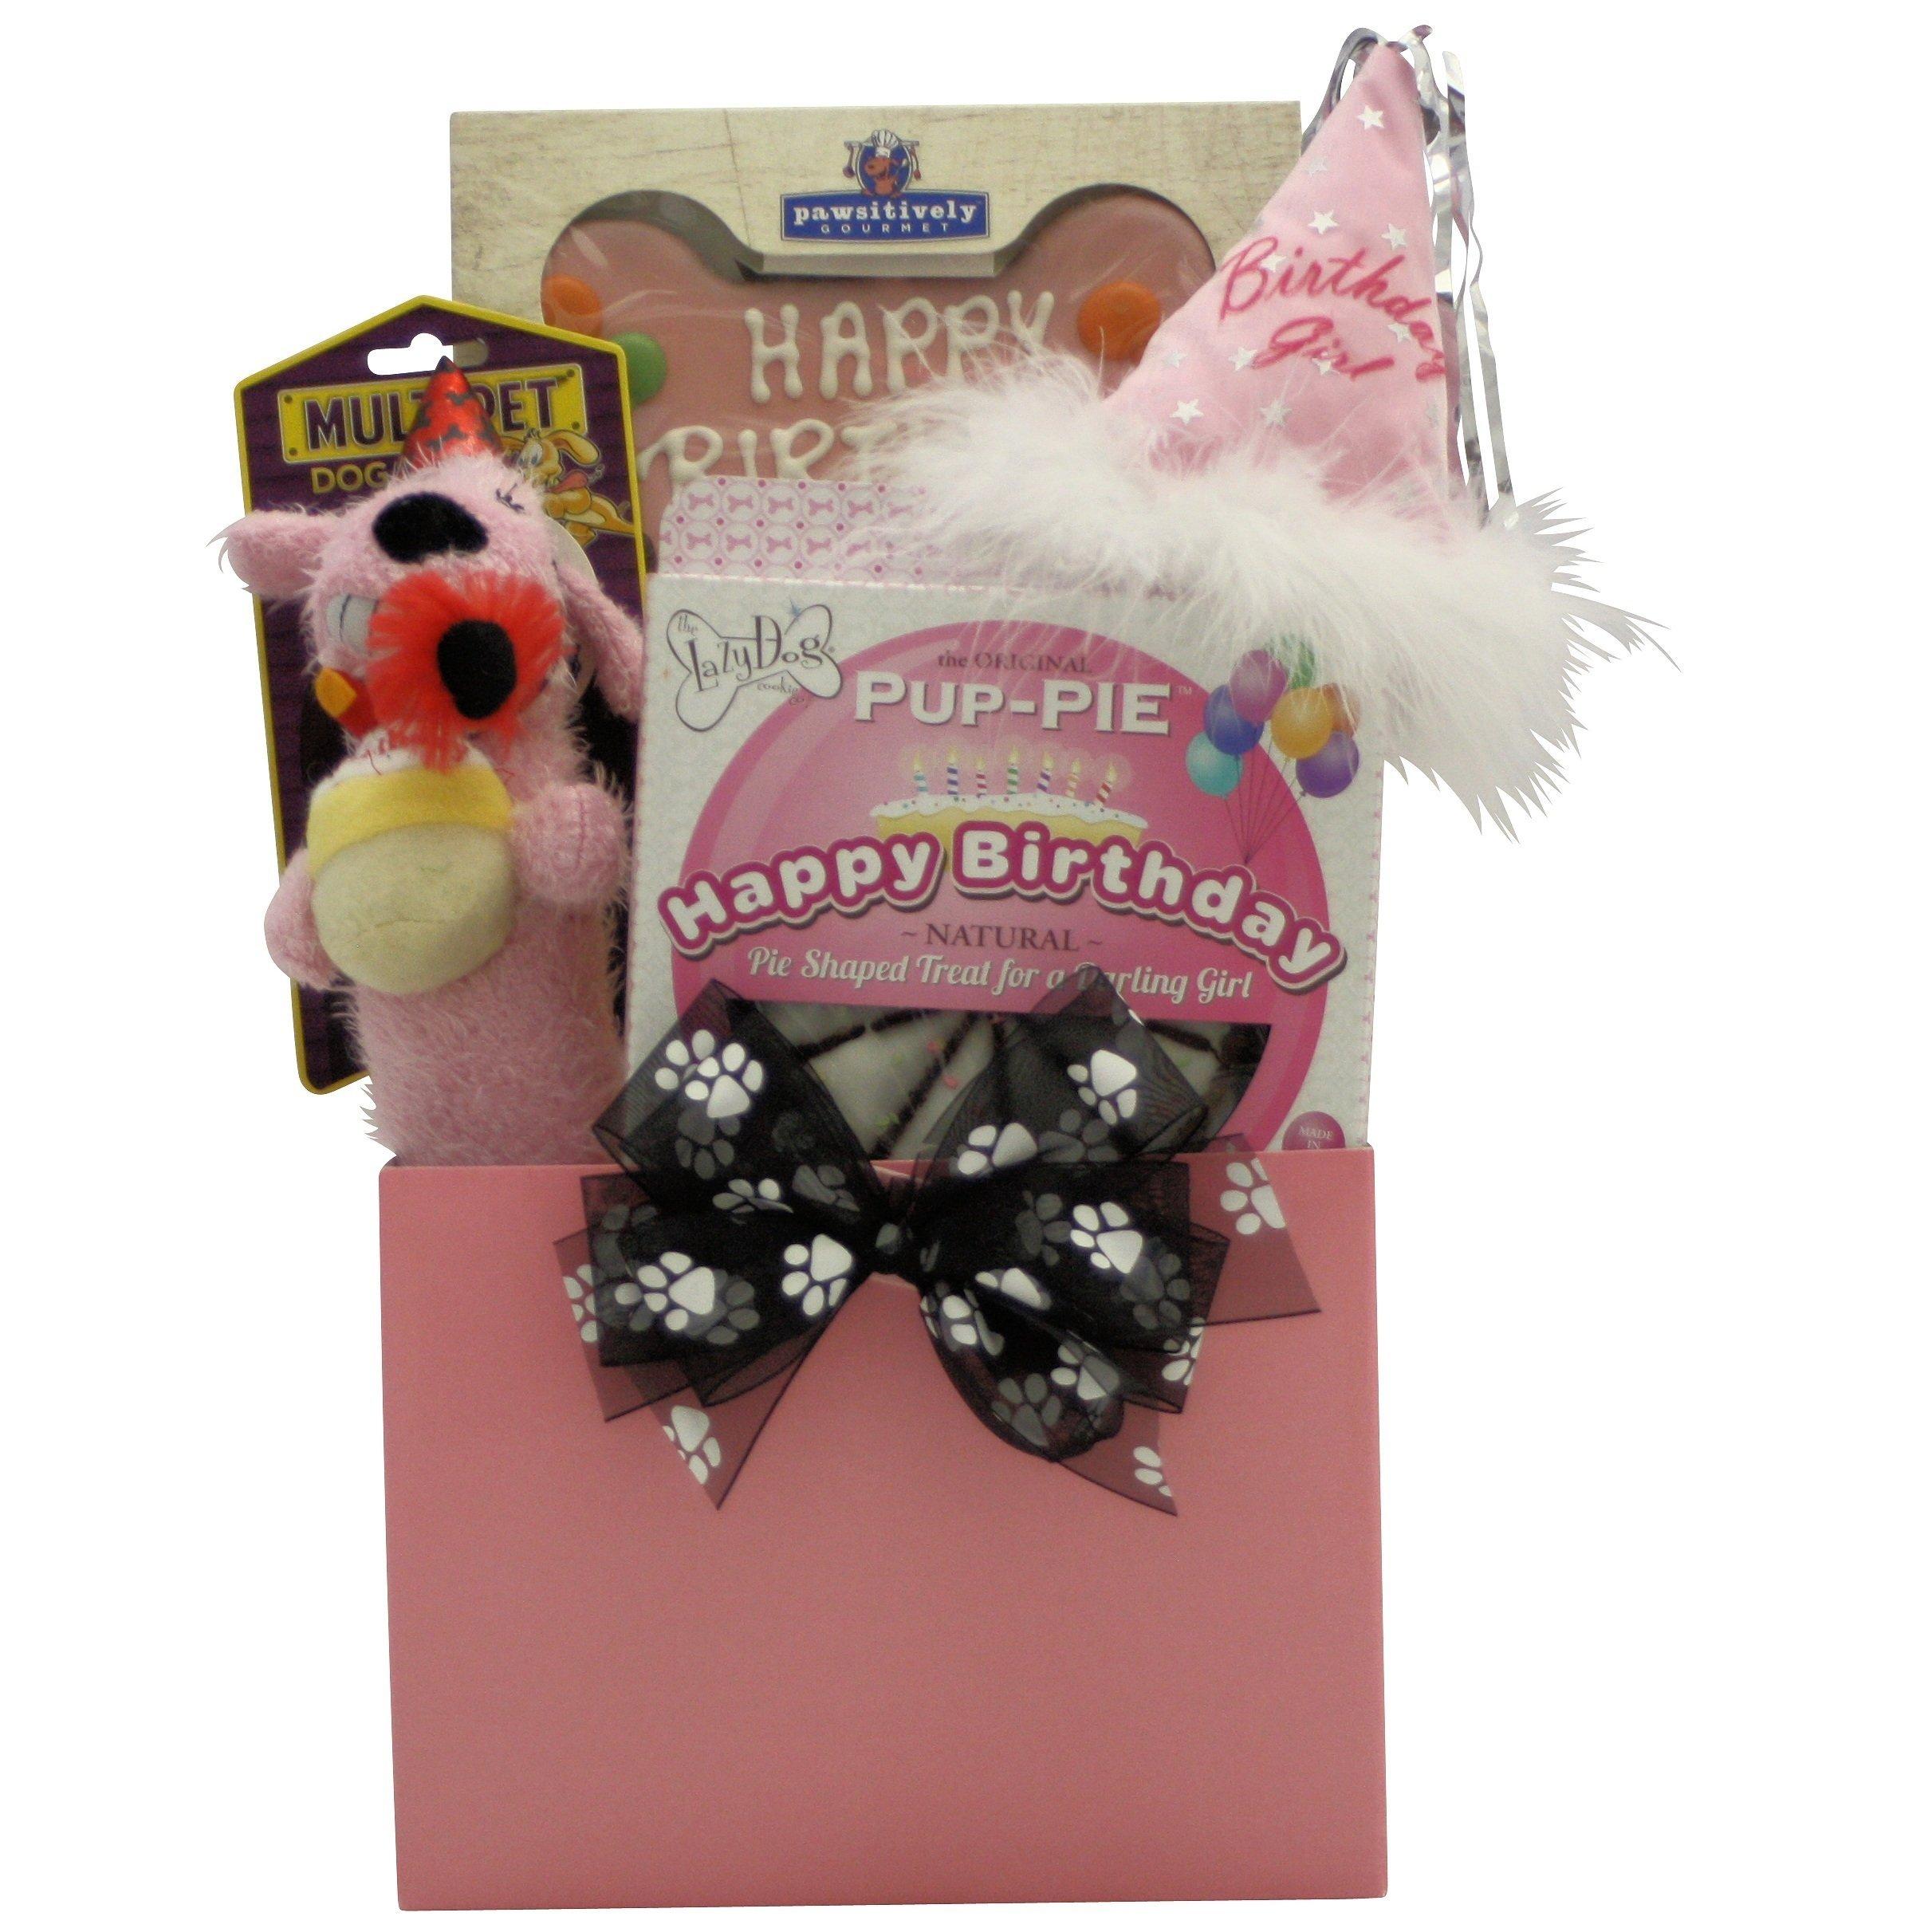 GreatArrivals Gift Baskets 1 Piece Happy Birthday Darling Girl! Pet Dog Birthday Gift Basket, 2 lb by GreatArrivals Gift Baskets (Image #1)